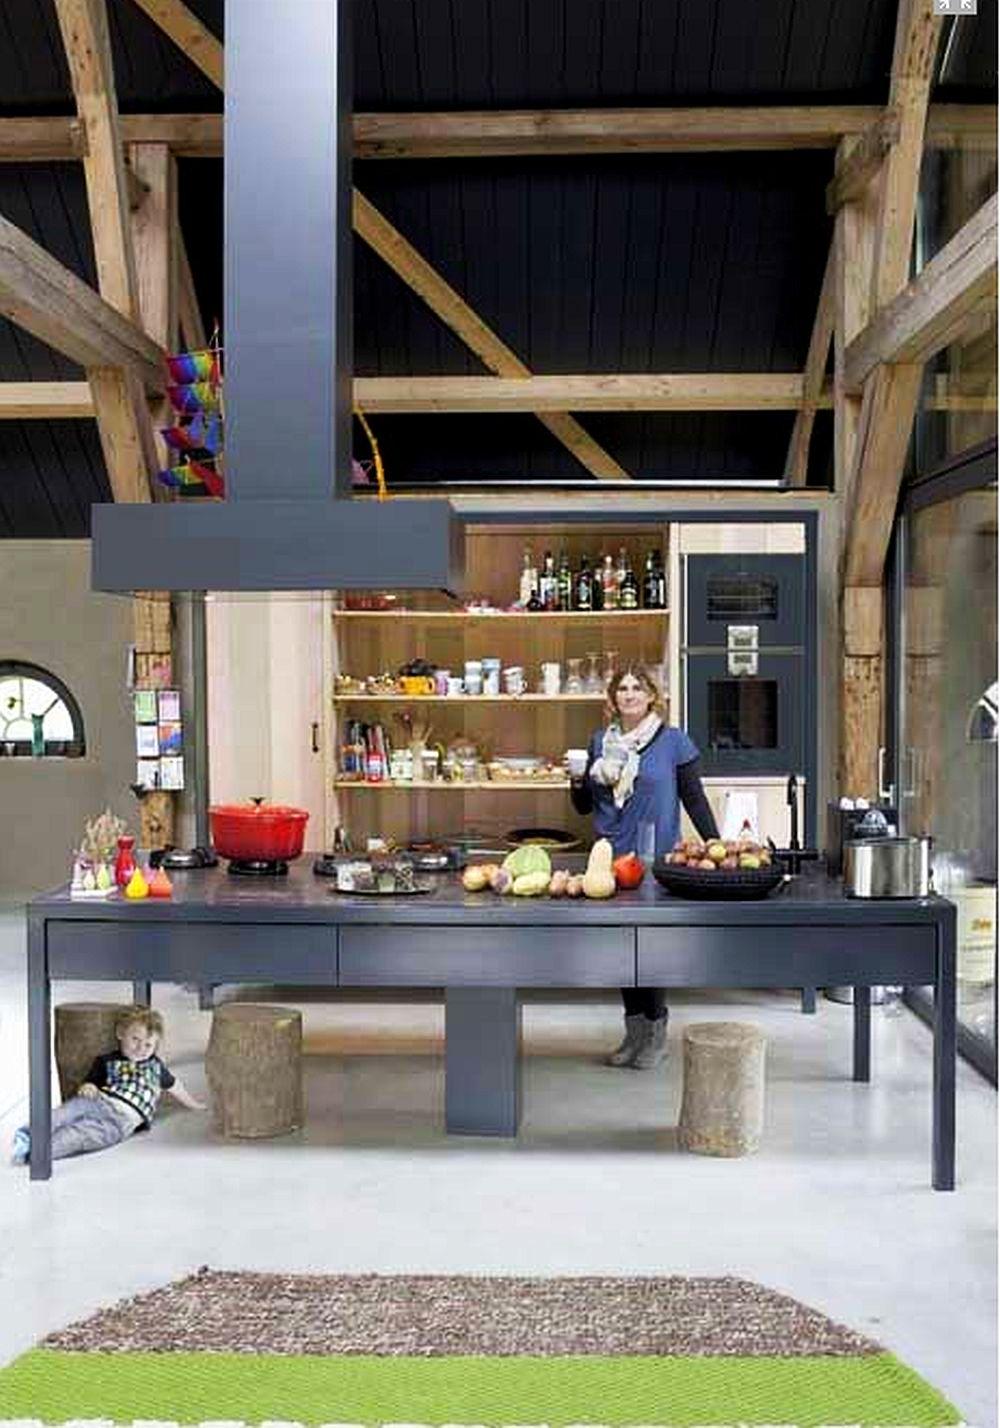 adelaparvu.com about modern farm, designer Larissa van Seumeren, Photo Viva Vida and Living Agency (13)